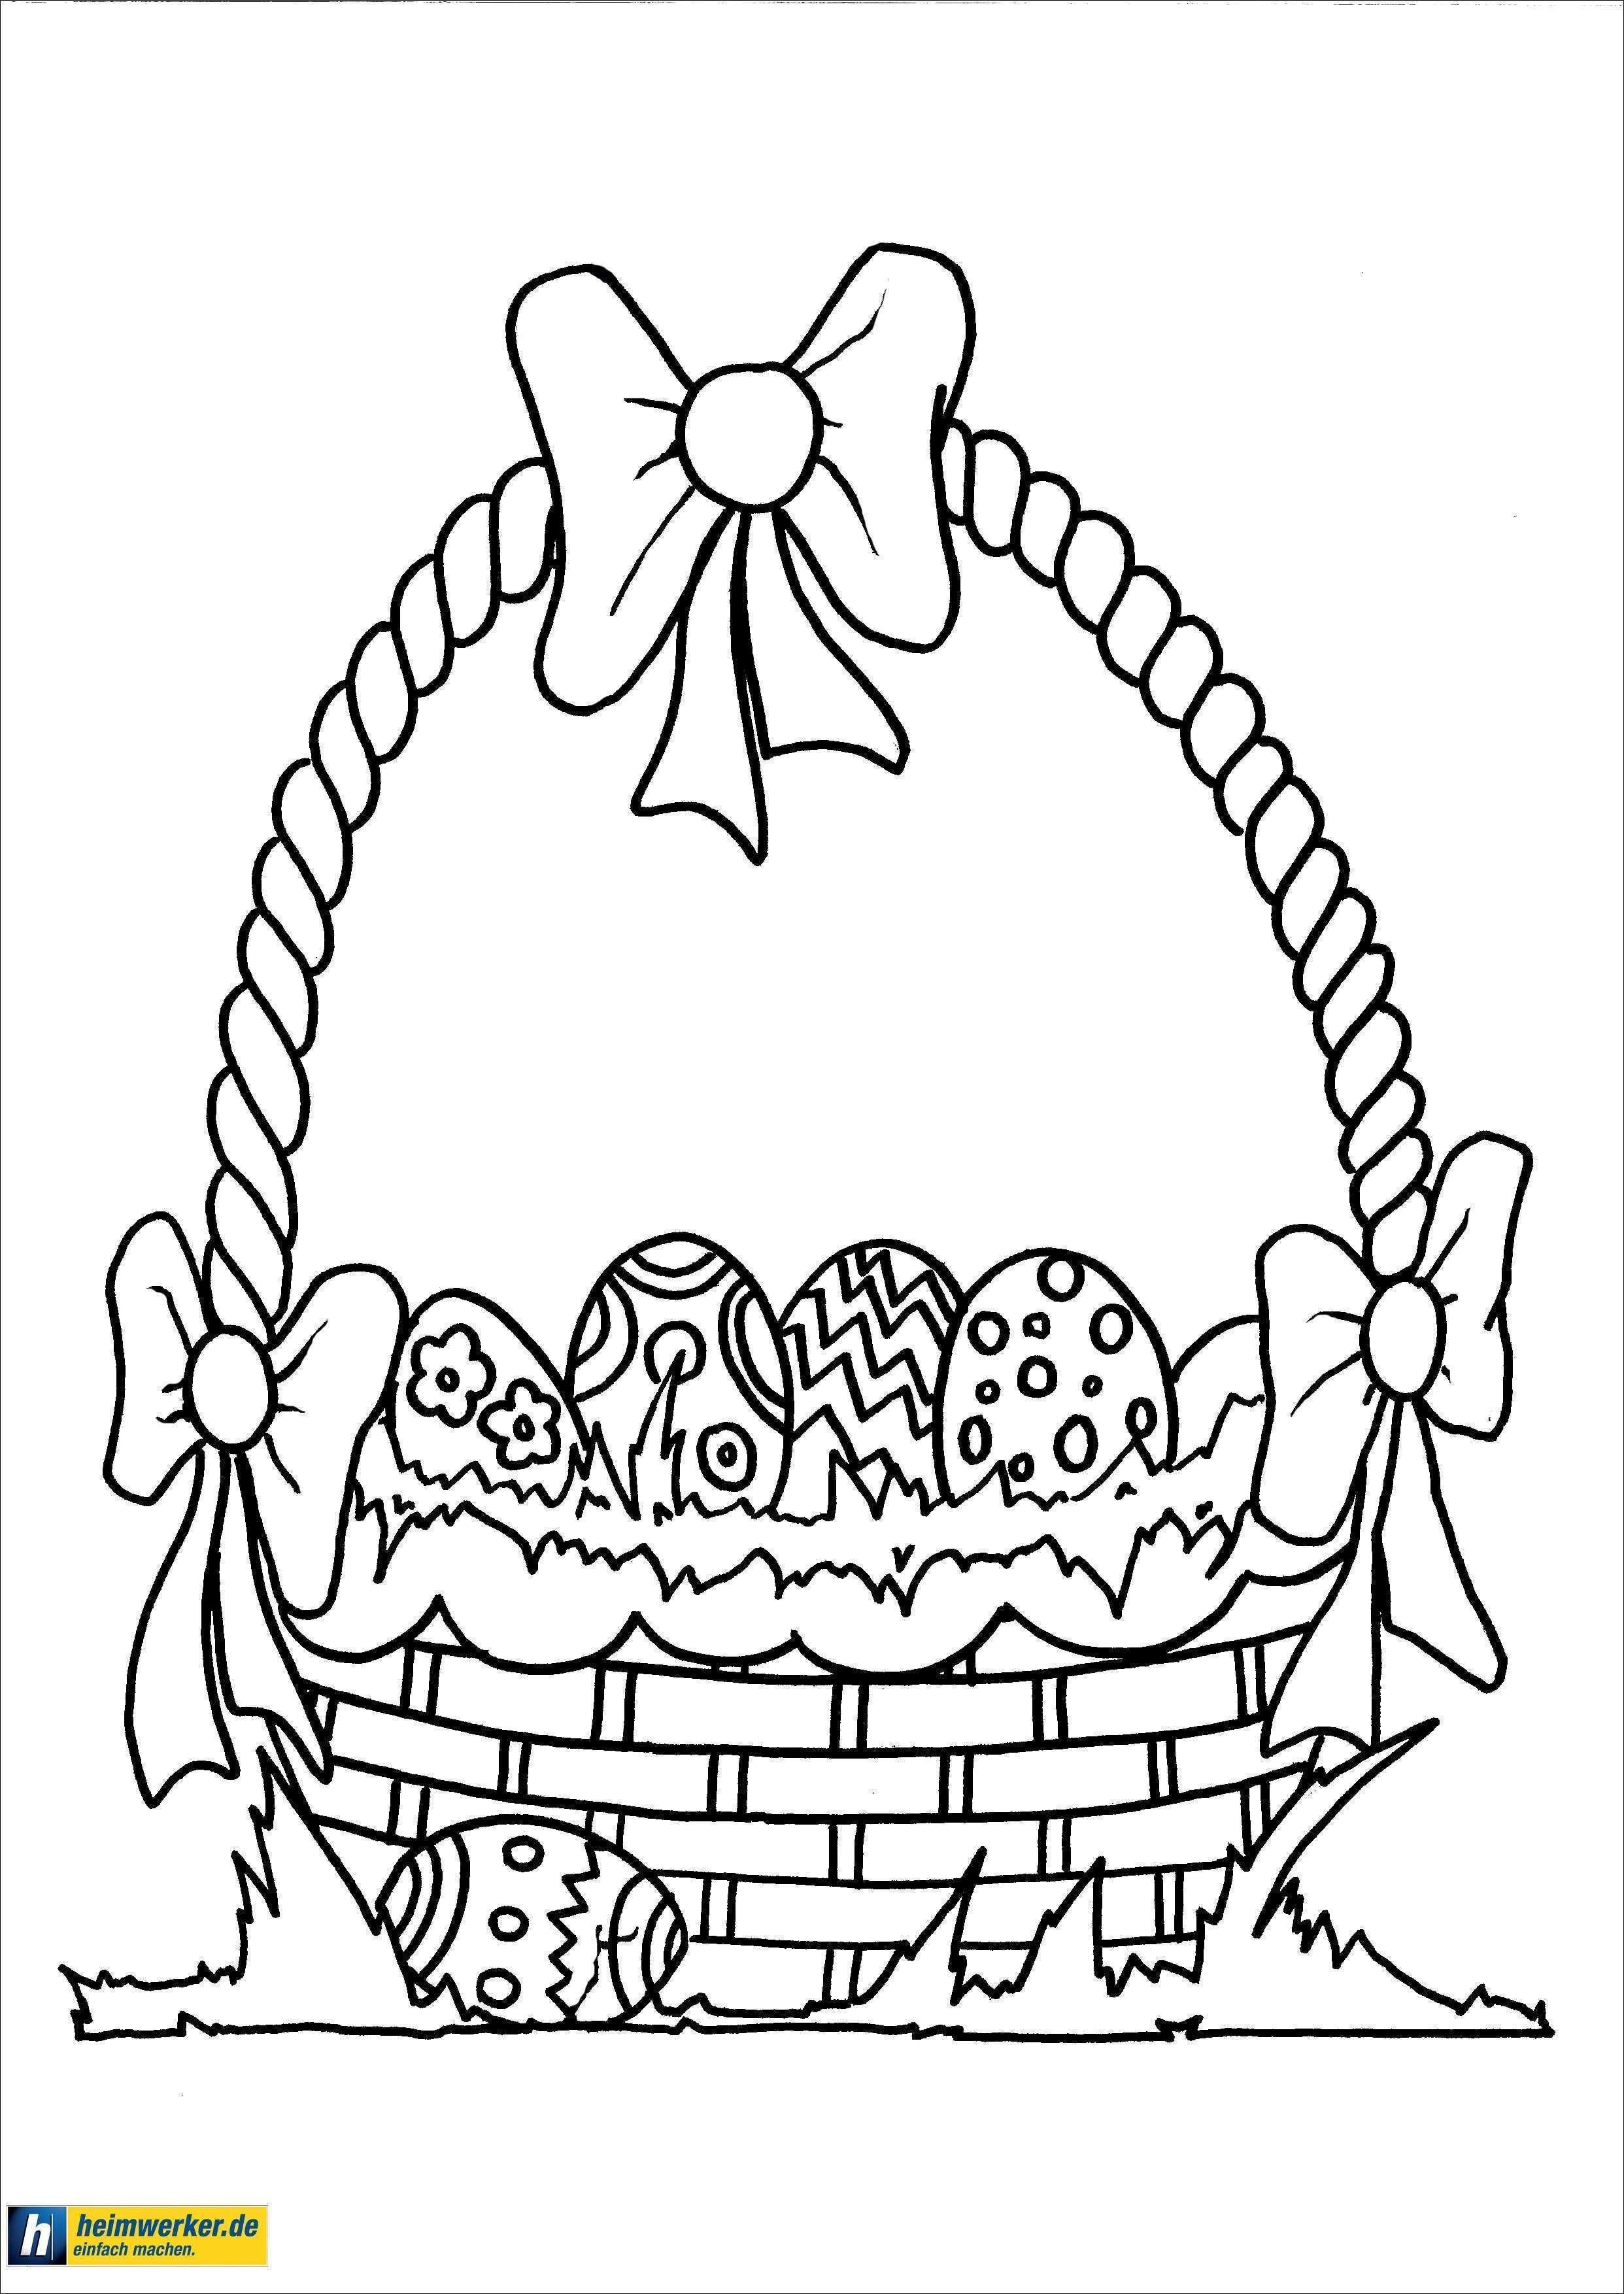 Ausmalbild Harry Potter Inspirierend Harry Potter Ausmalbilder Wappen Bildnis – Ausmalbilder Ideen Fotos